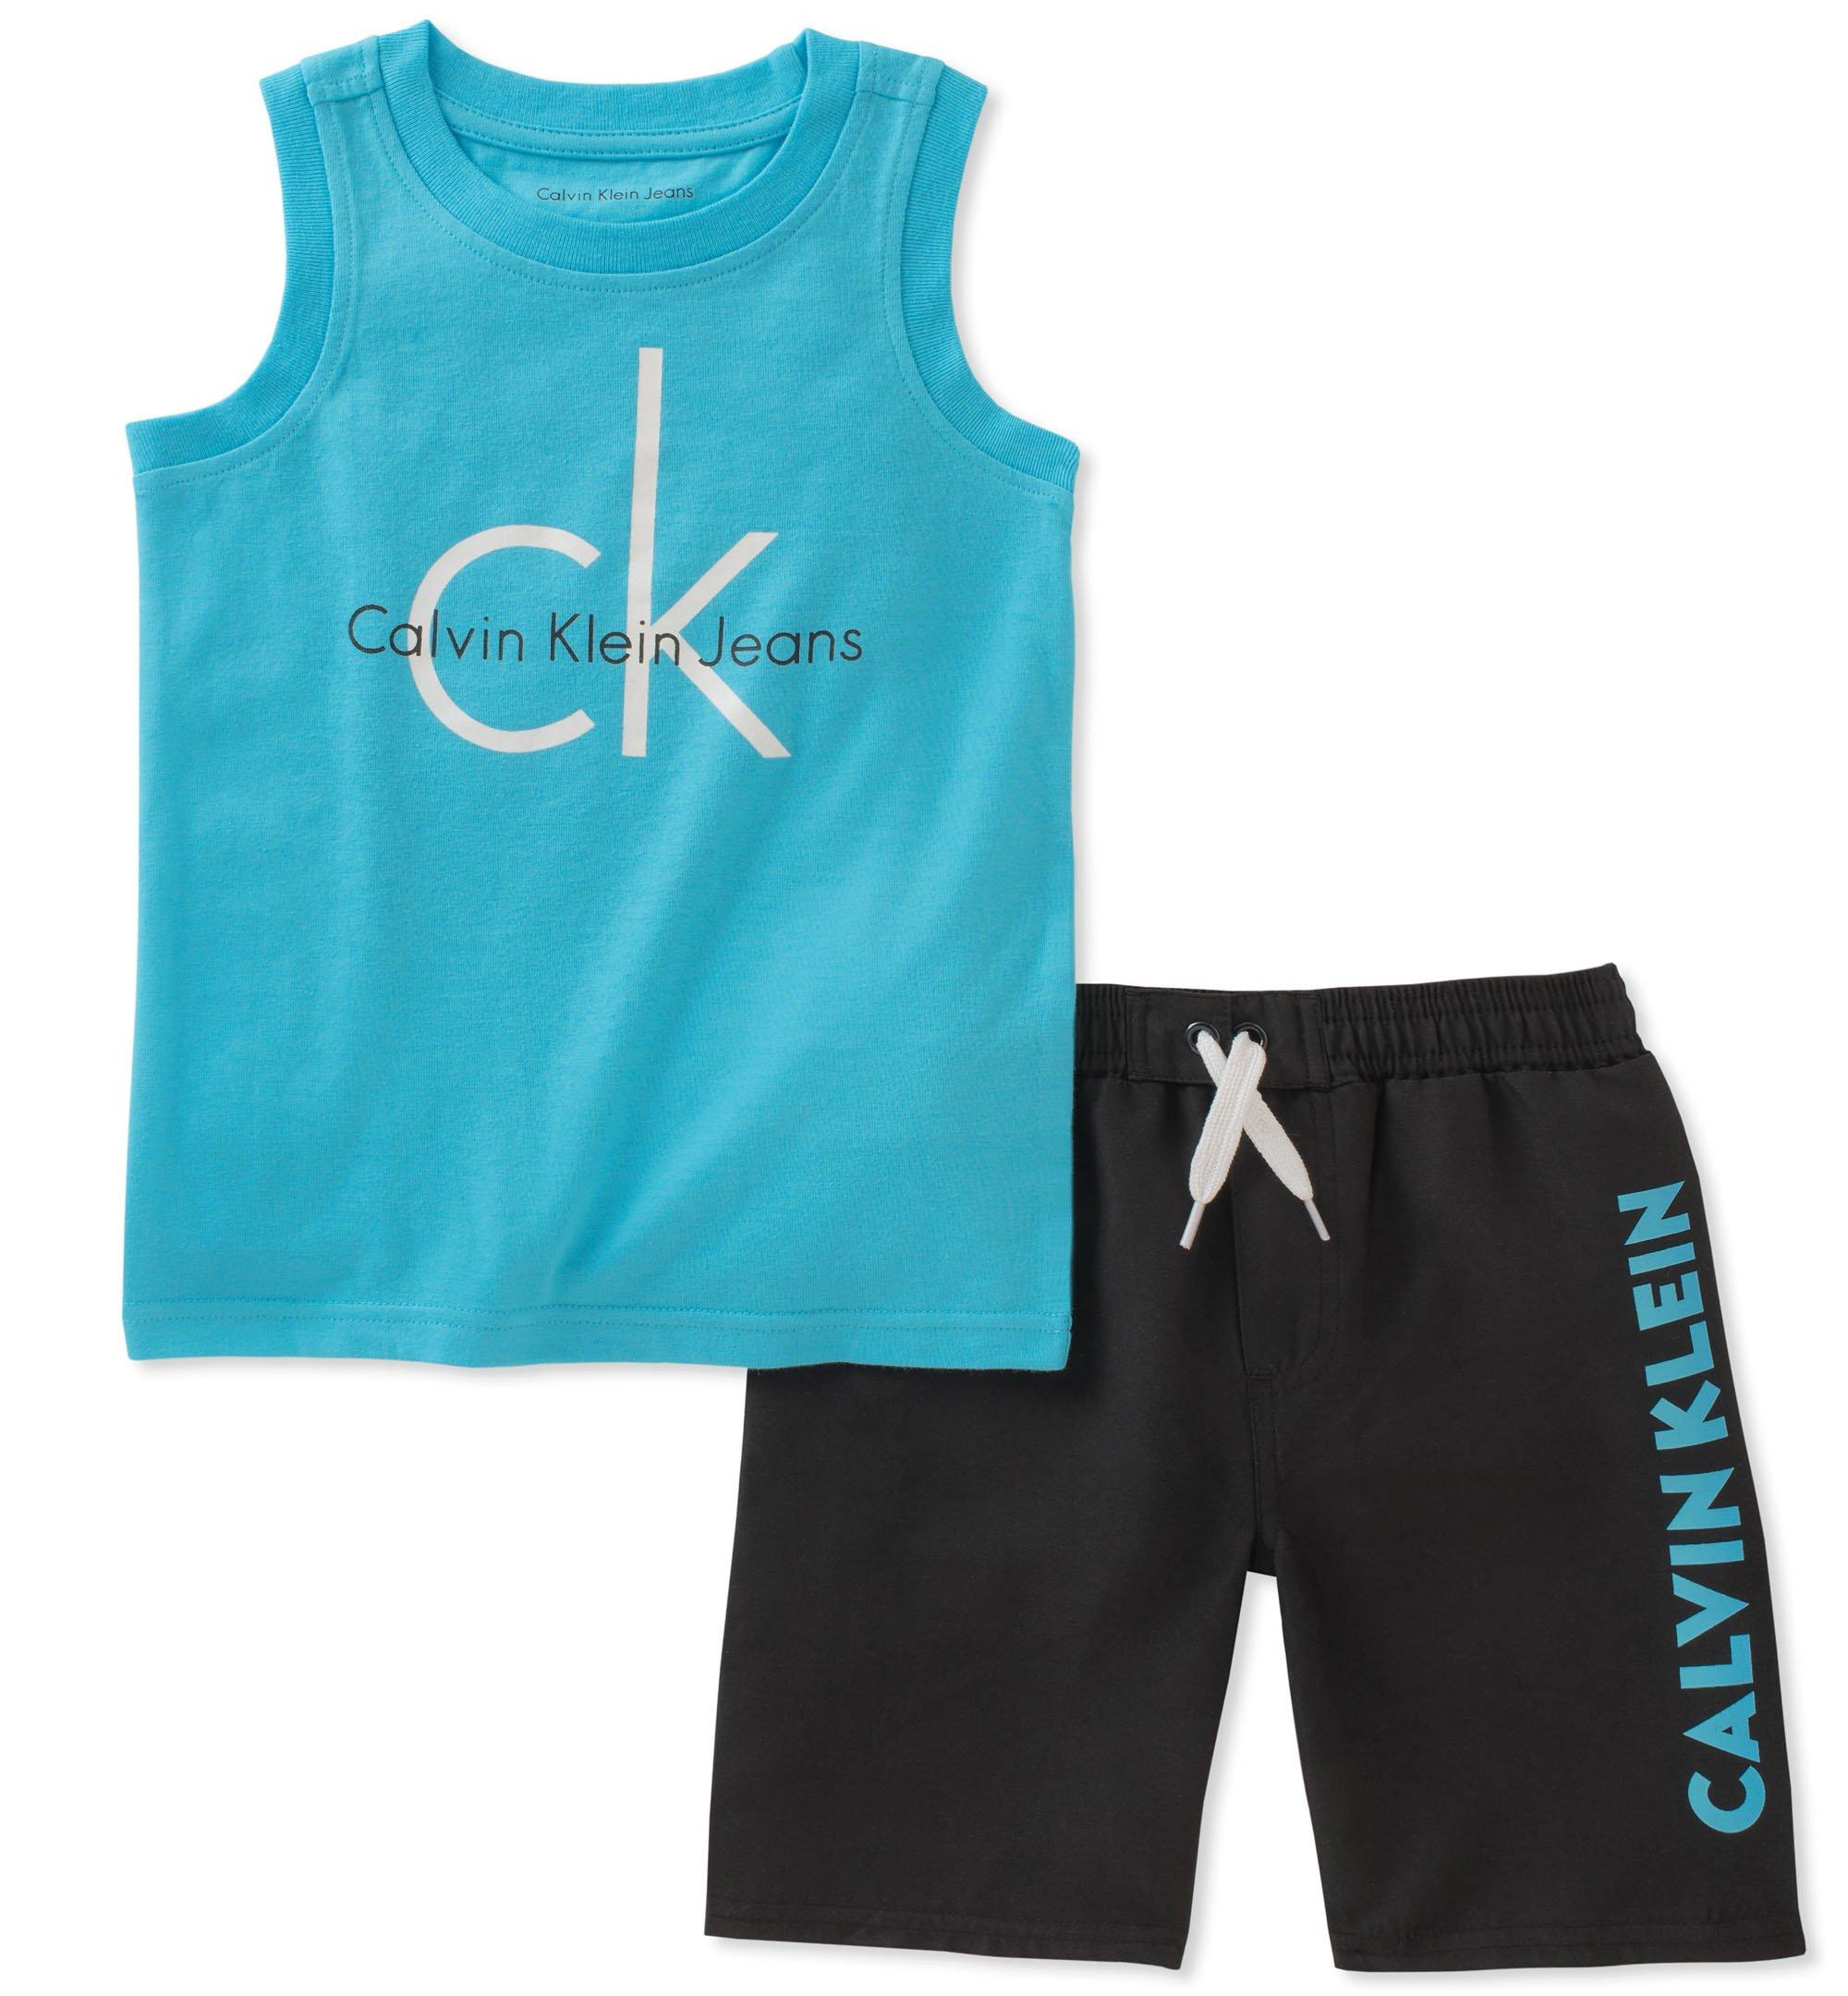 Calvin Klein Boys 2 Pieces Muscle Top Shorts Set, Blue/Black 12